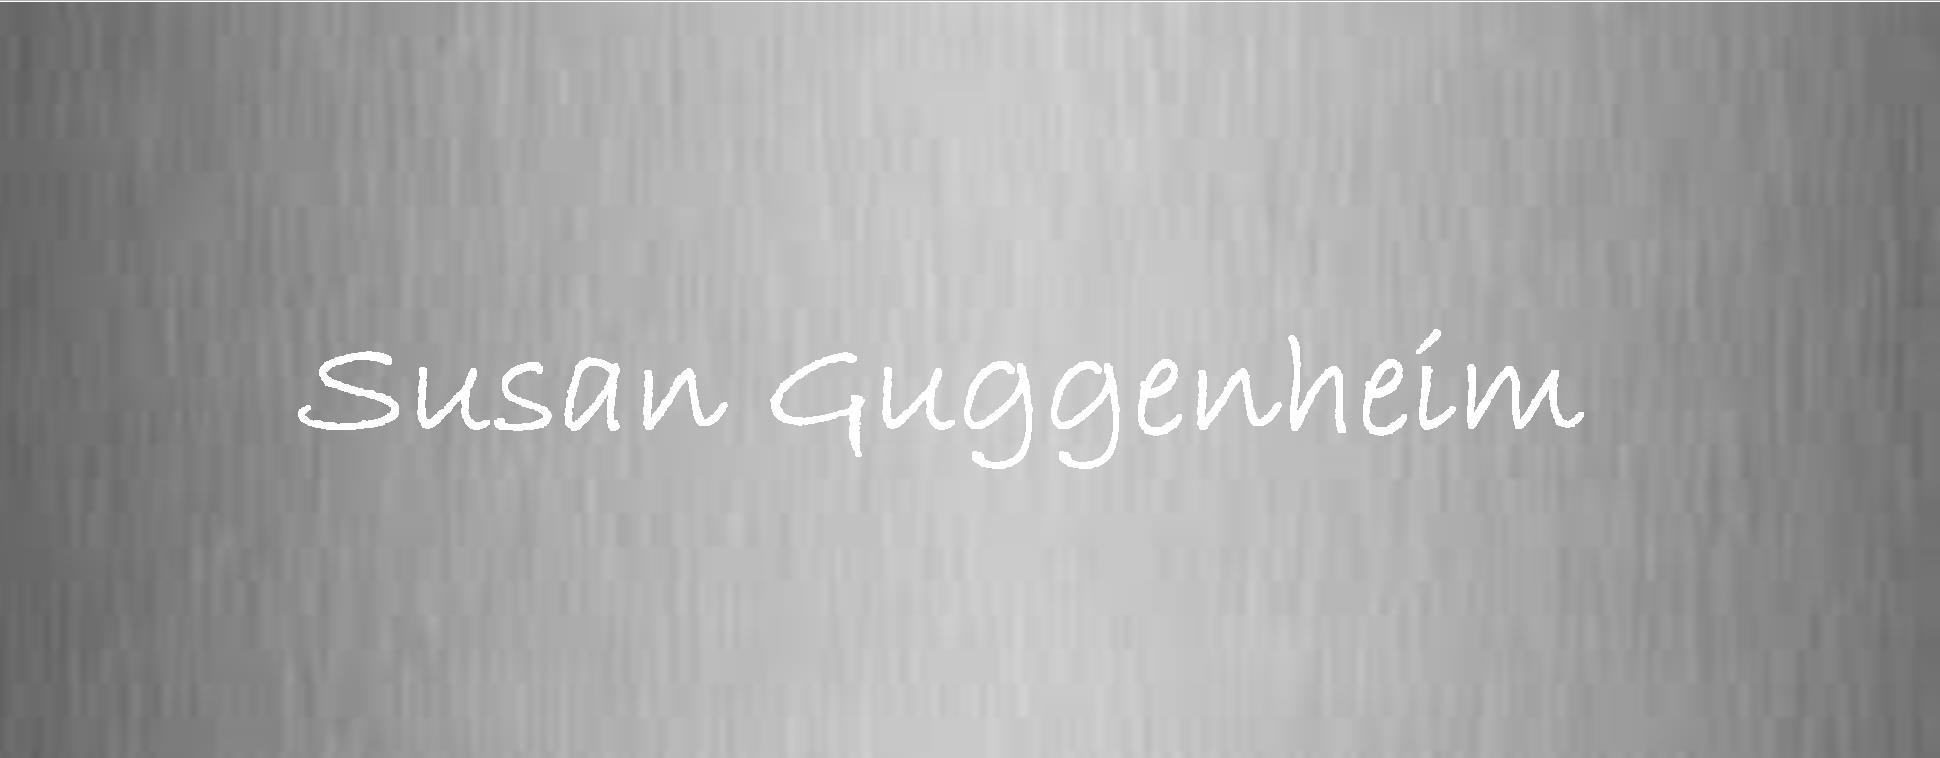 Susan Guggenheim.jpg